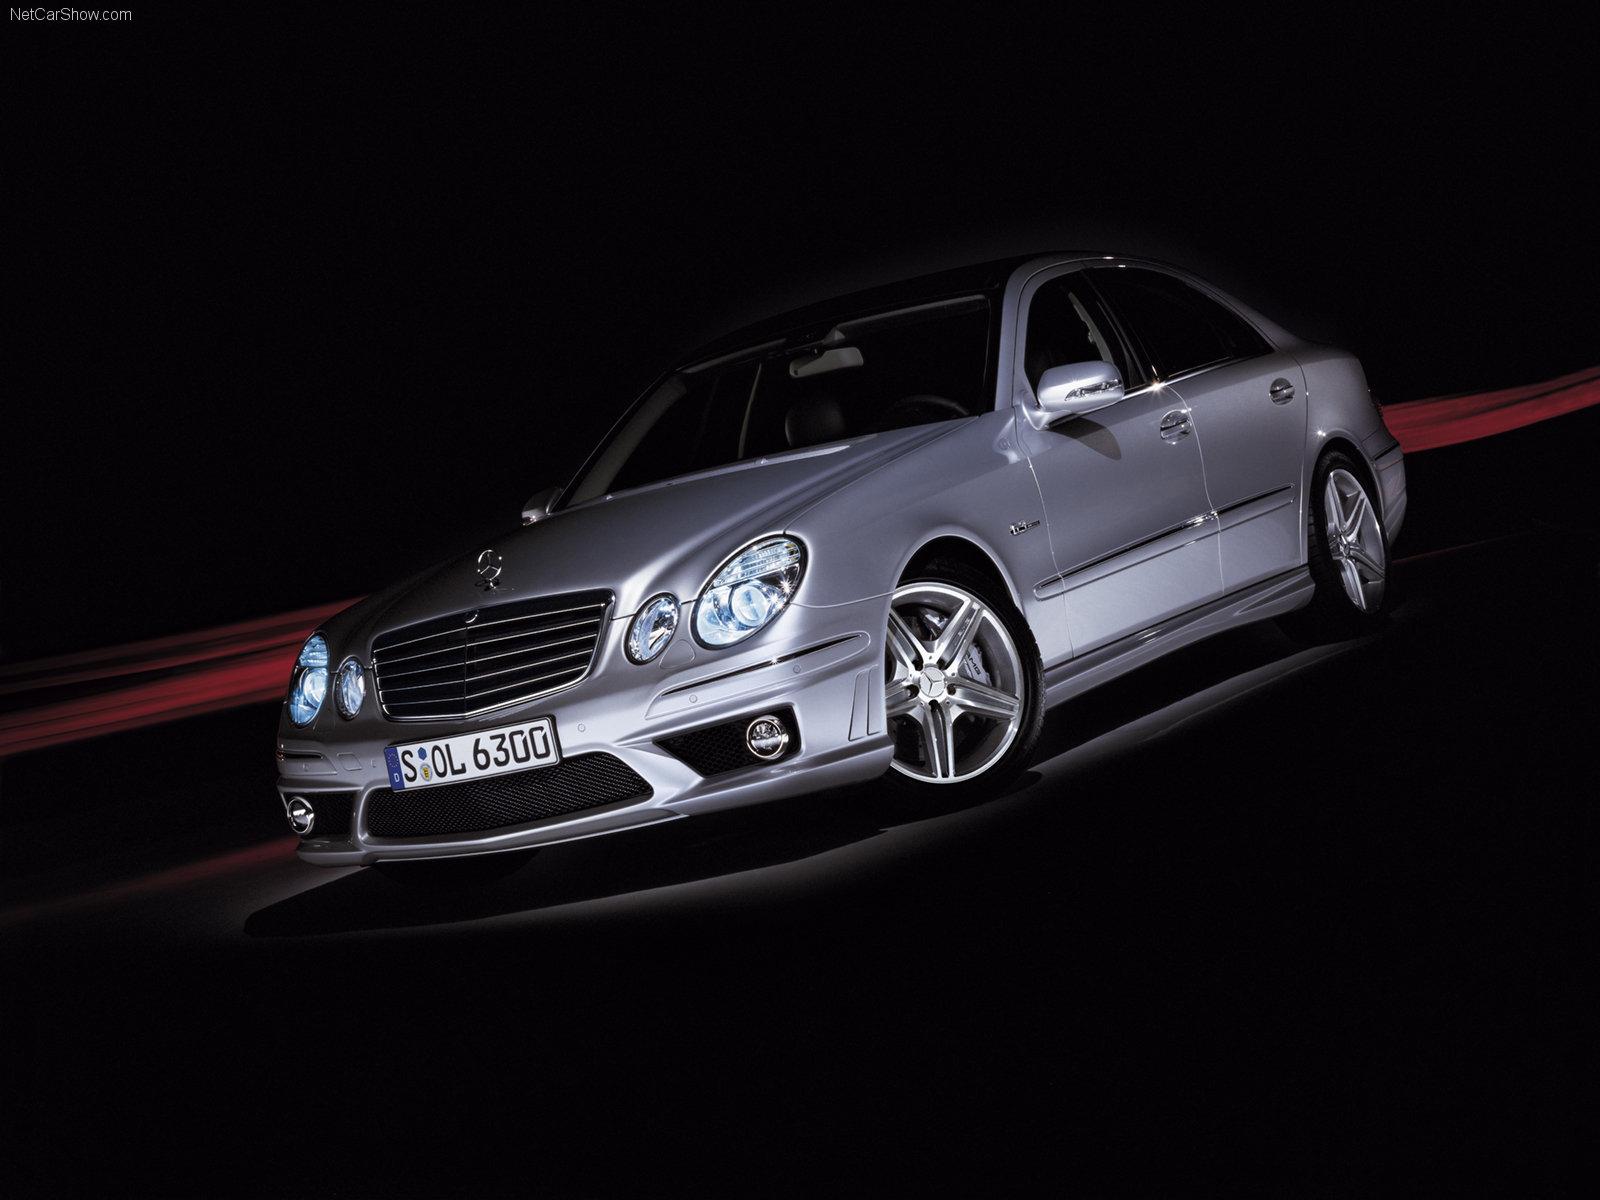 Mercedes benz e class amg picture 33701 mercedes benz for Mercedes benz amg e class